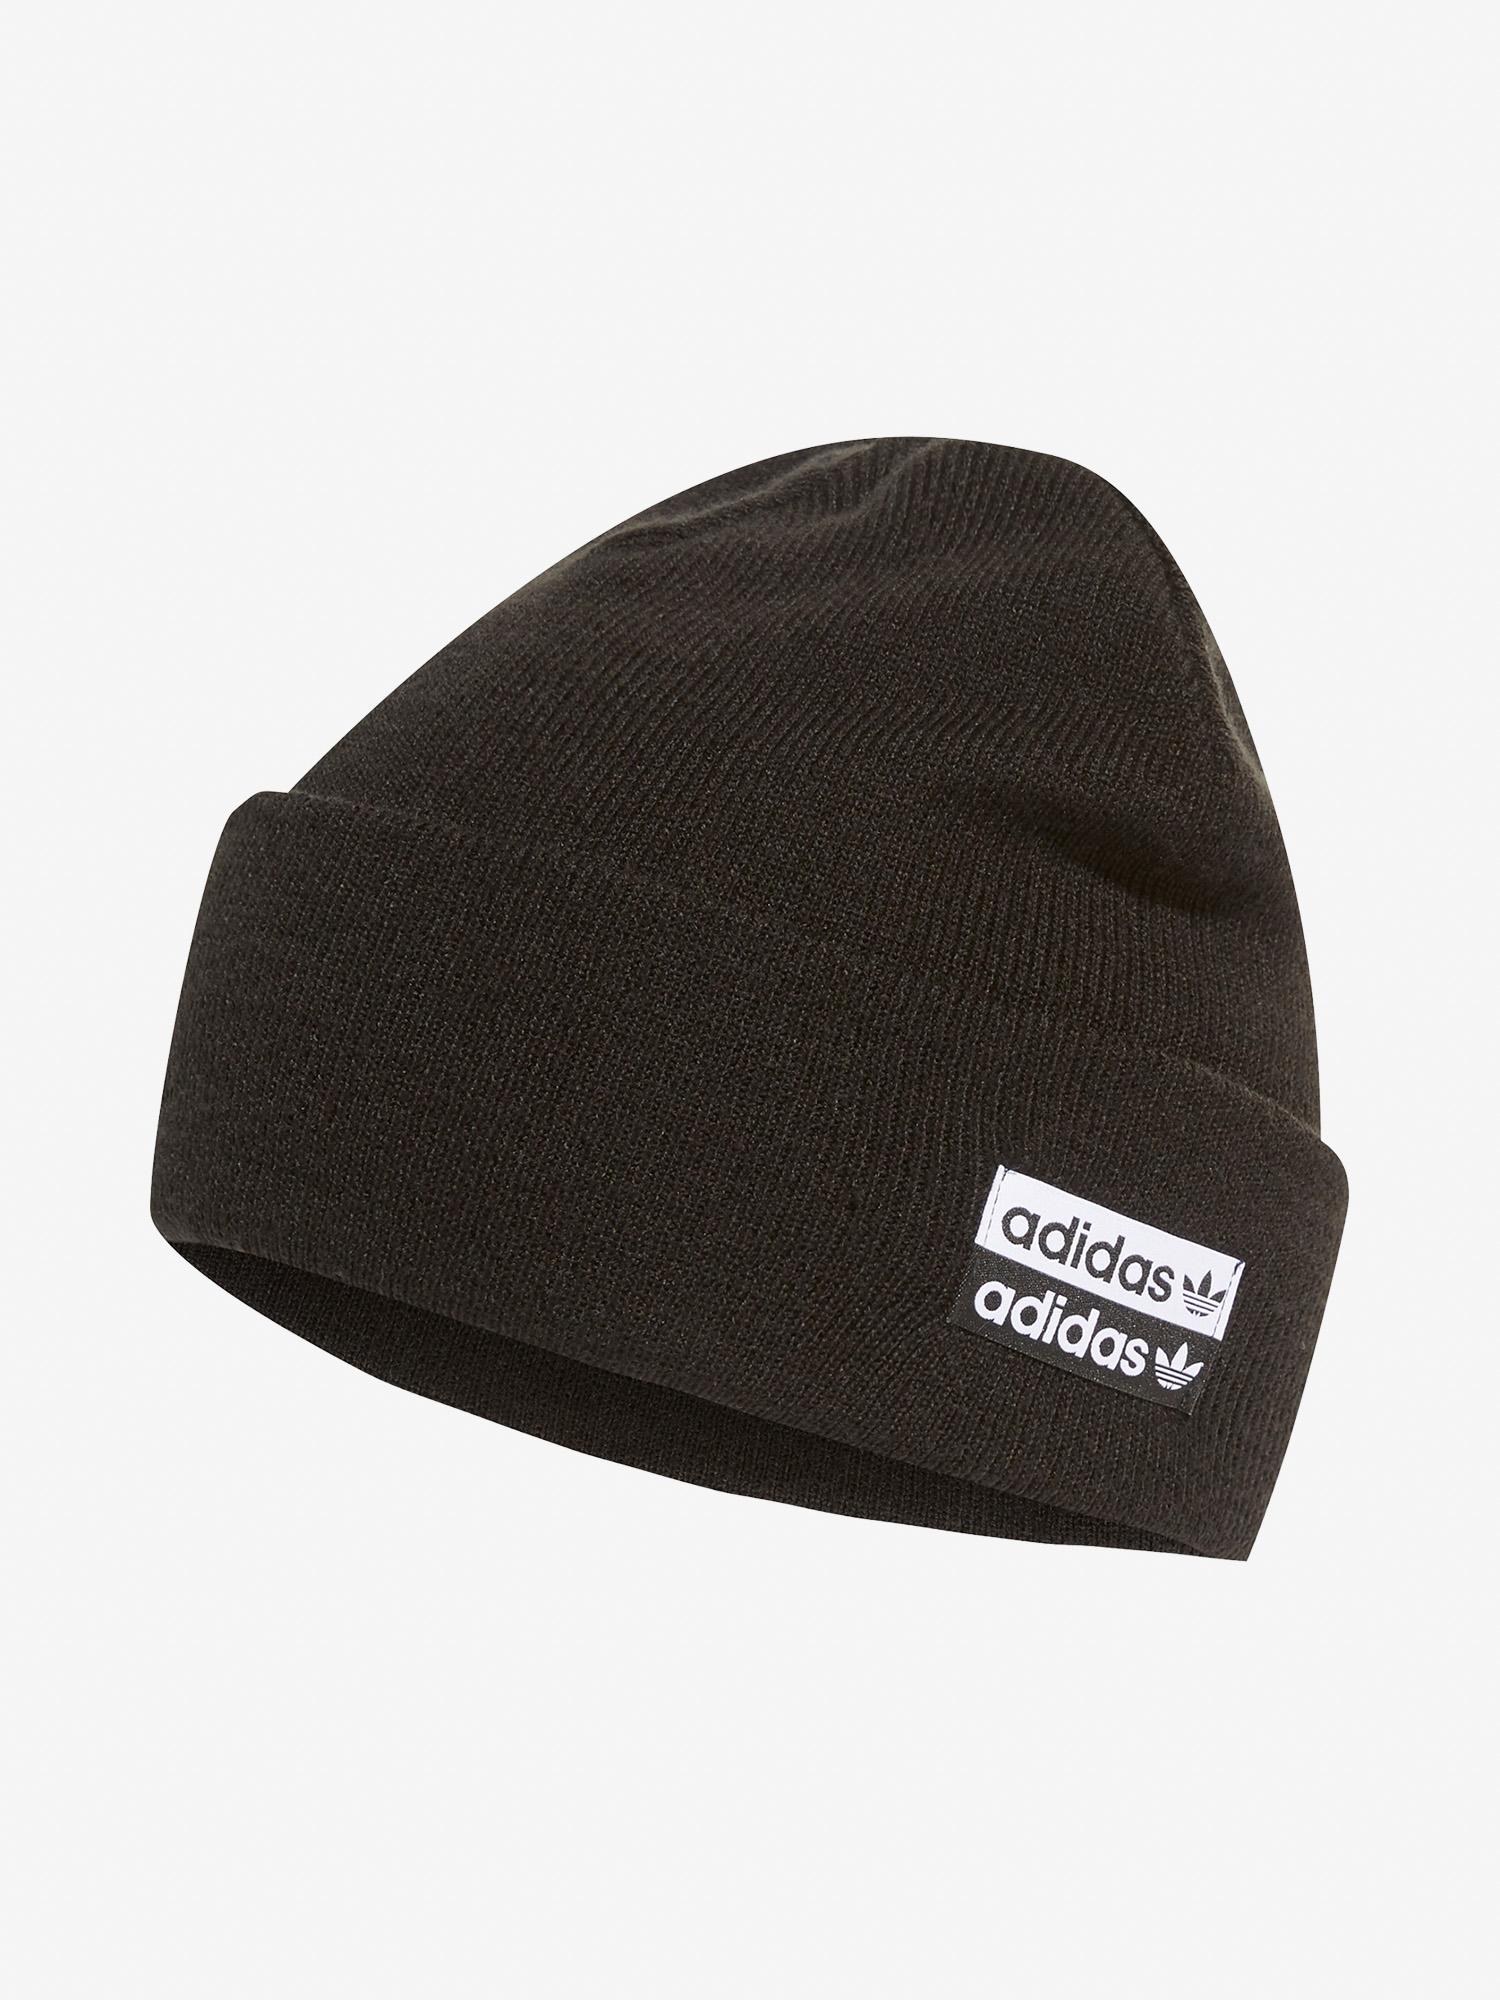 Adidas Originals Cuff Knit Hat